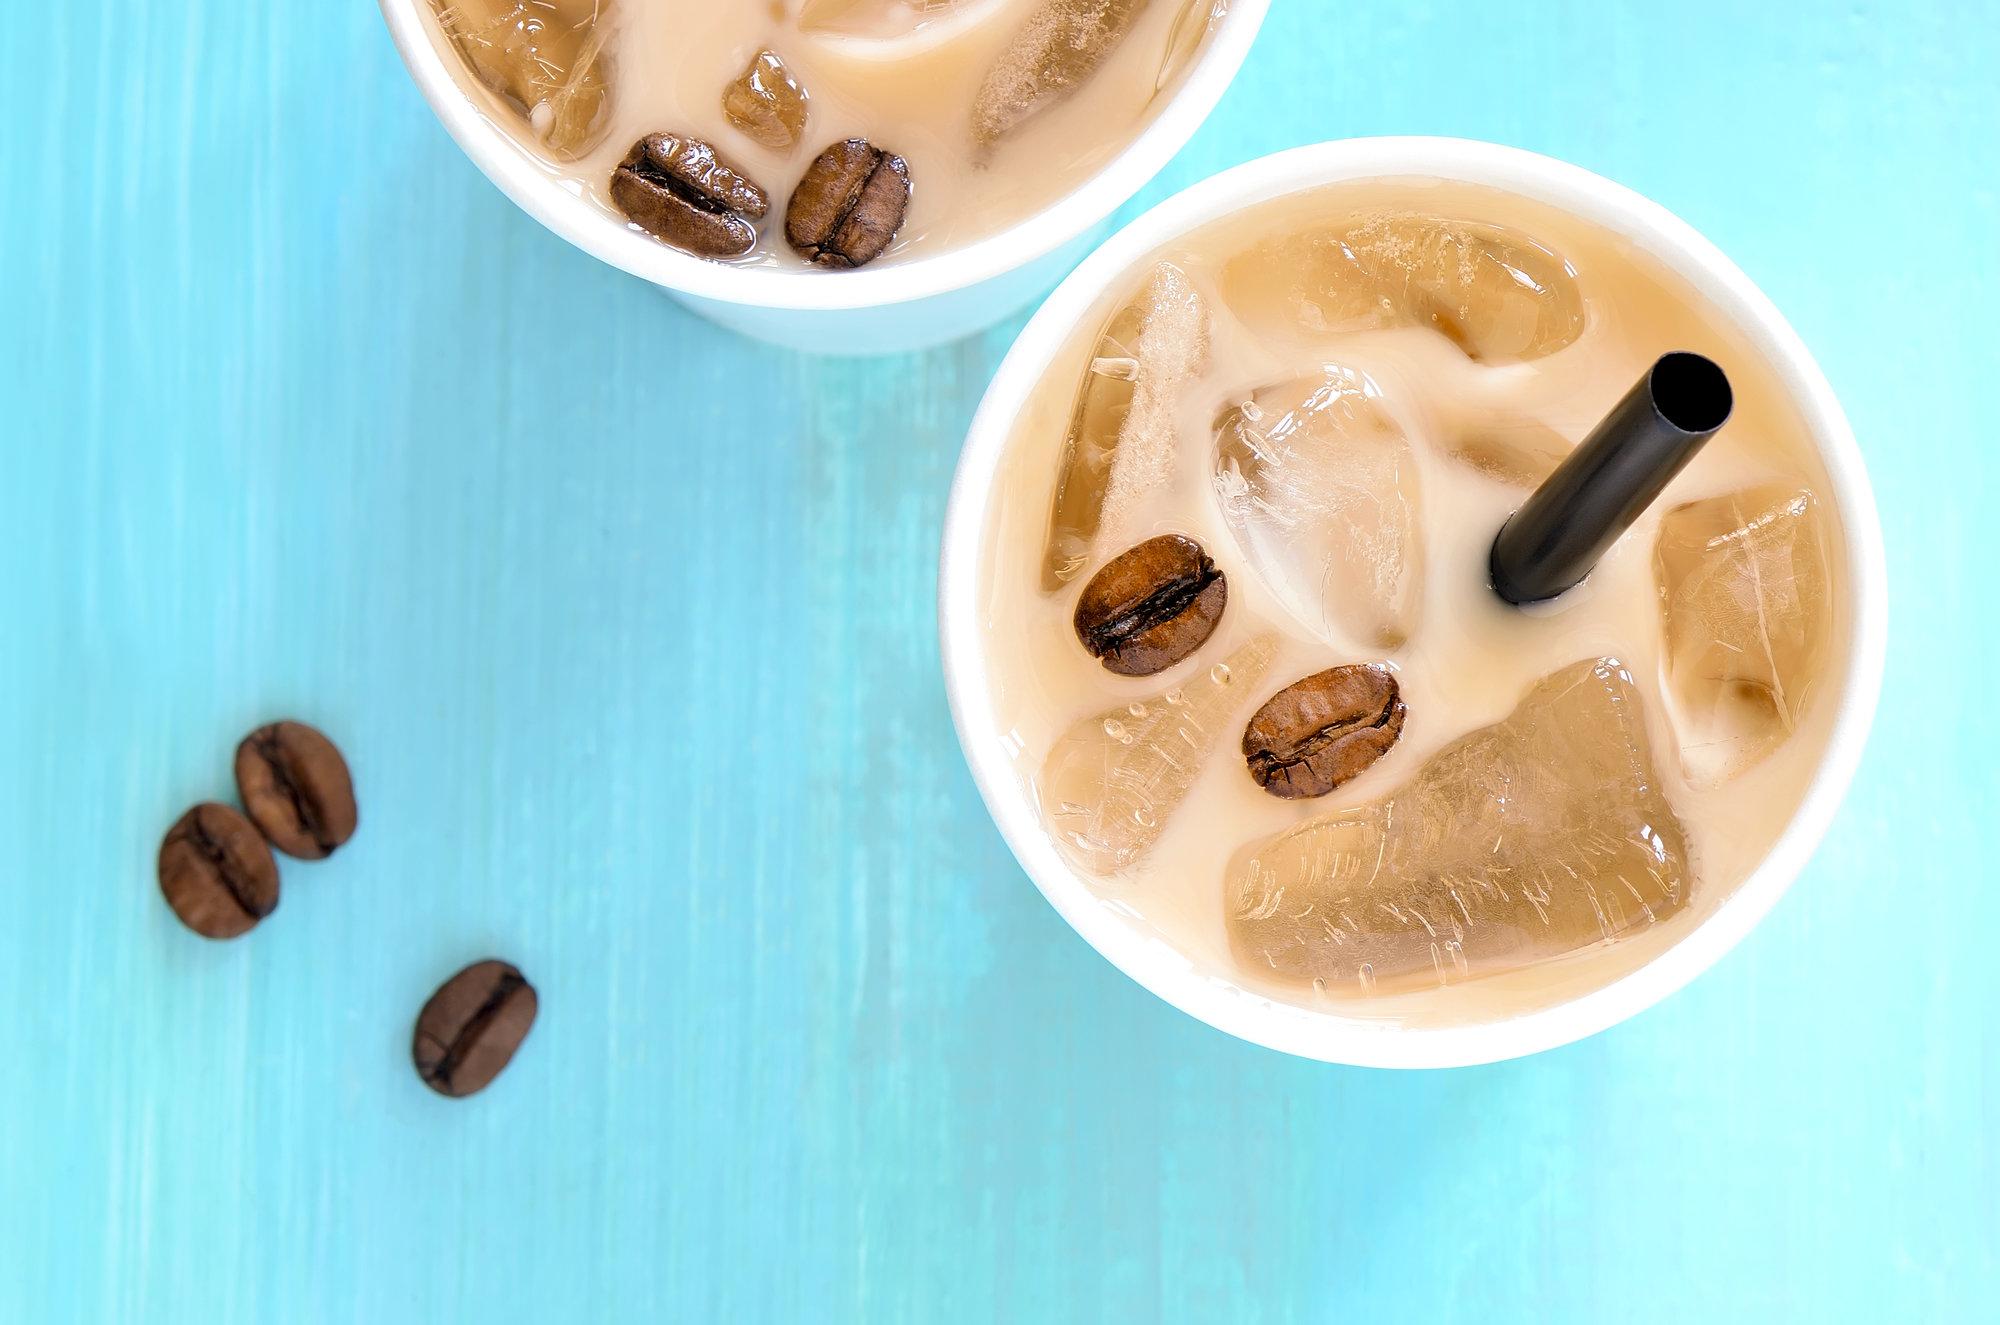 Iced coffee selene genisella sgprogram